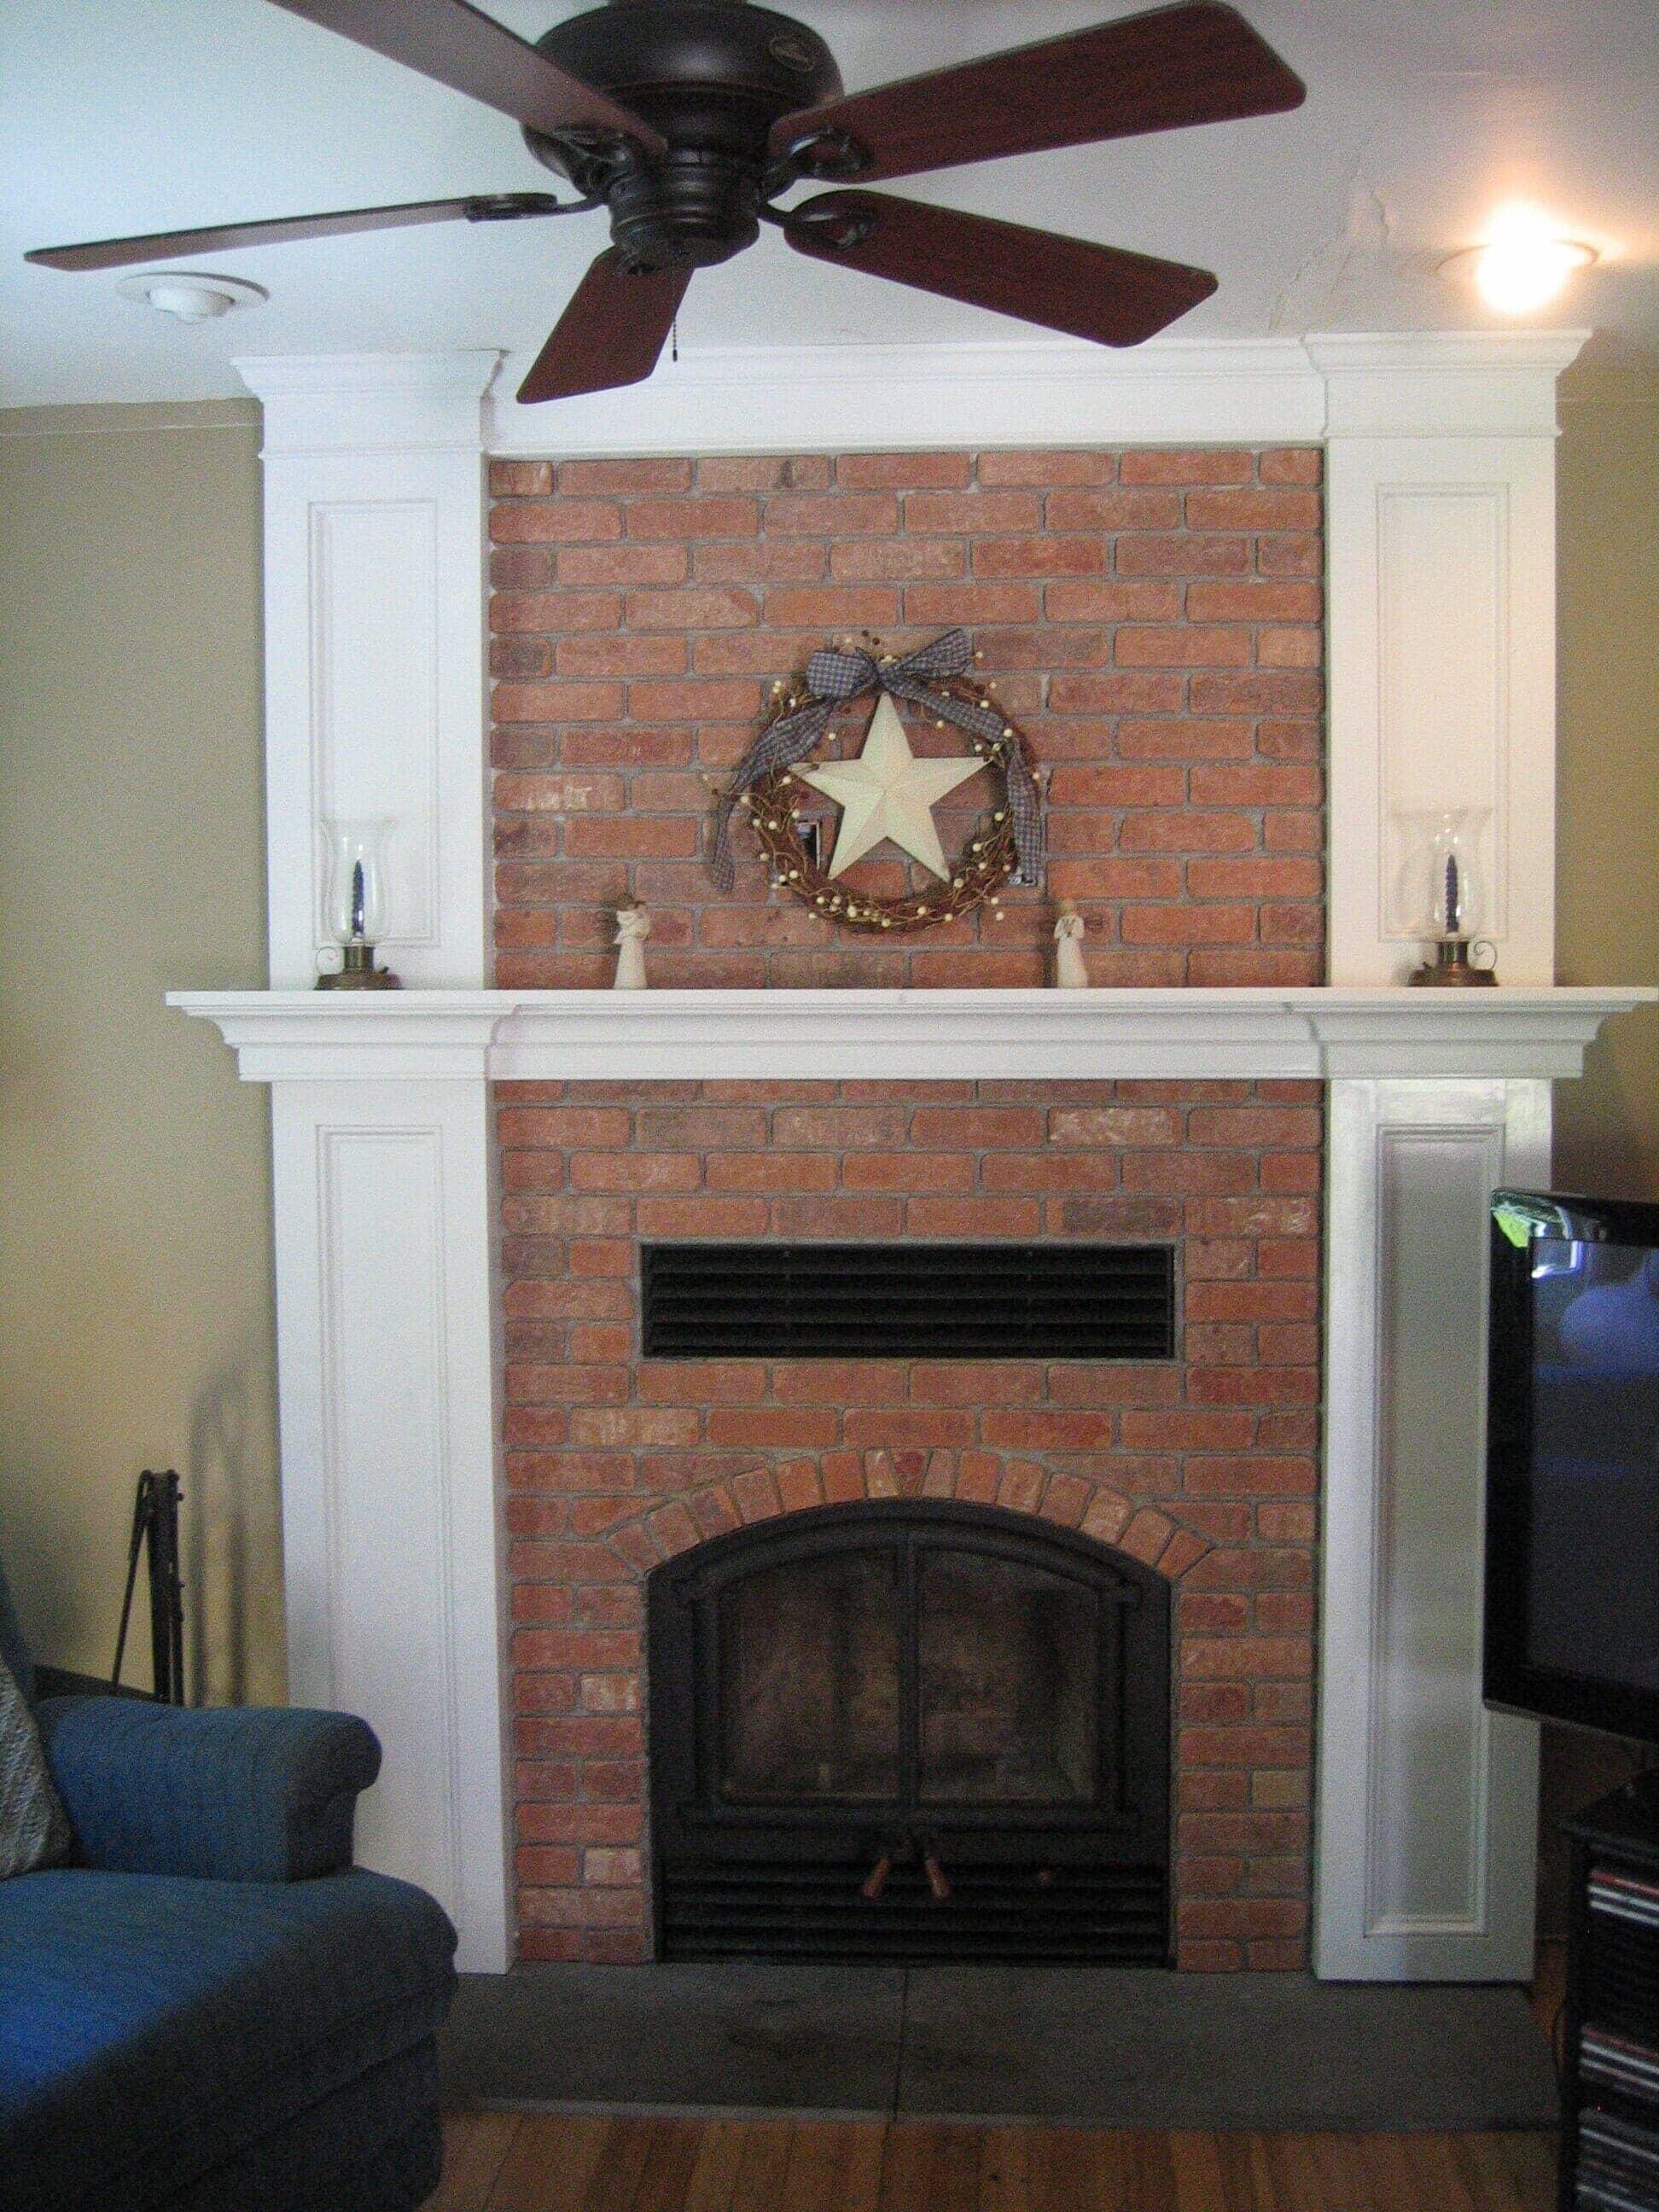 Fireside Warmth Inc image 6